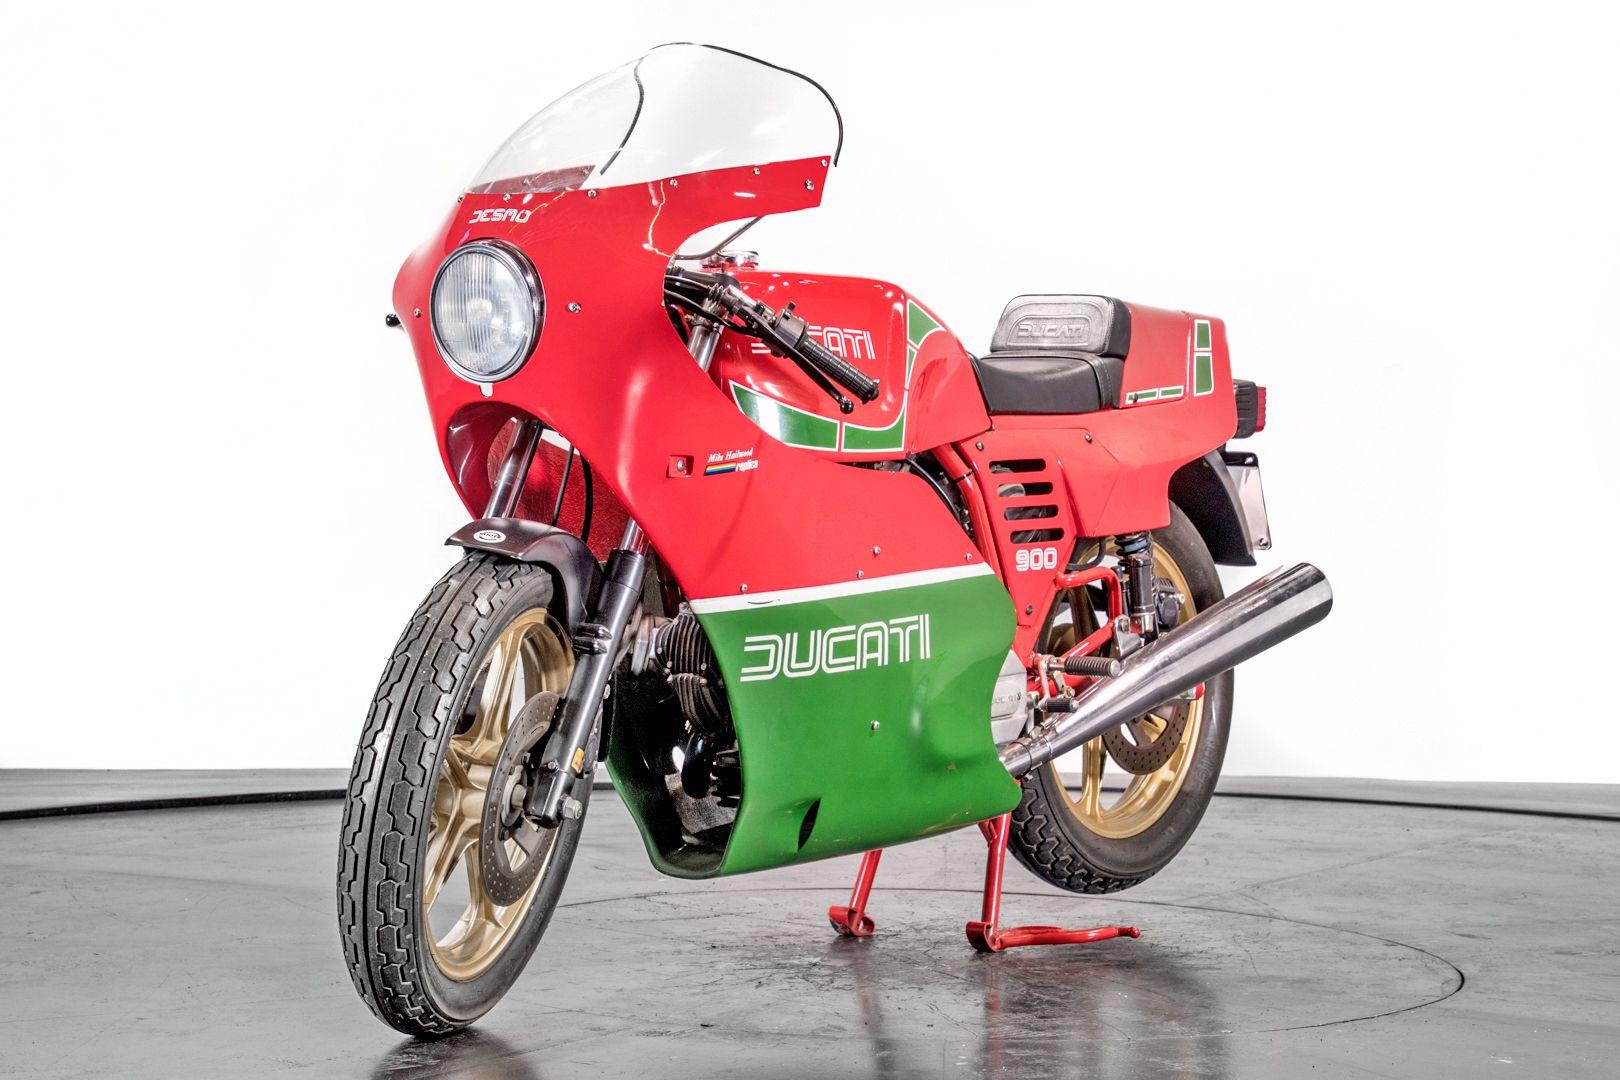 1984 Ducati 900 Mike Hailwood Replica 81553